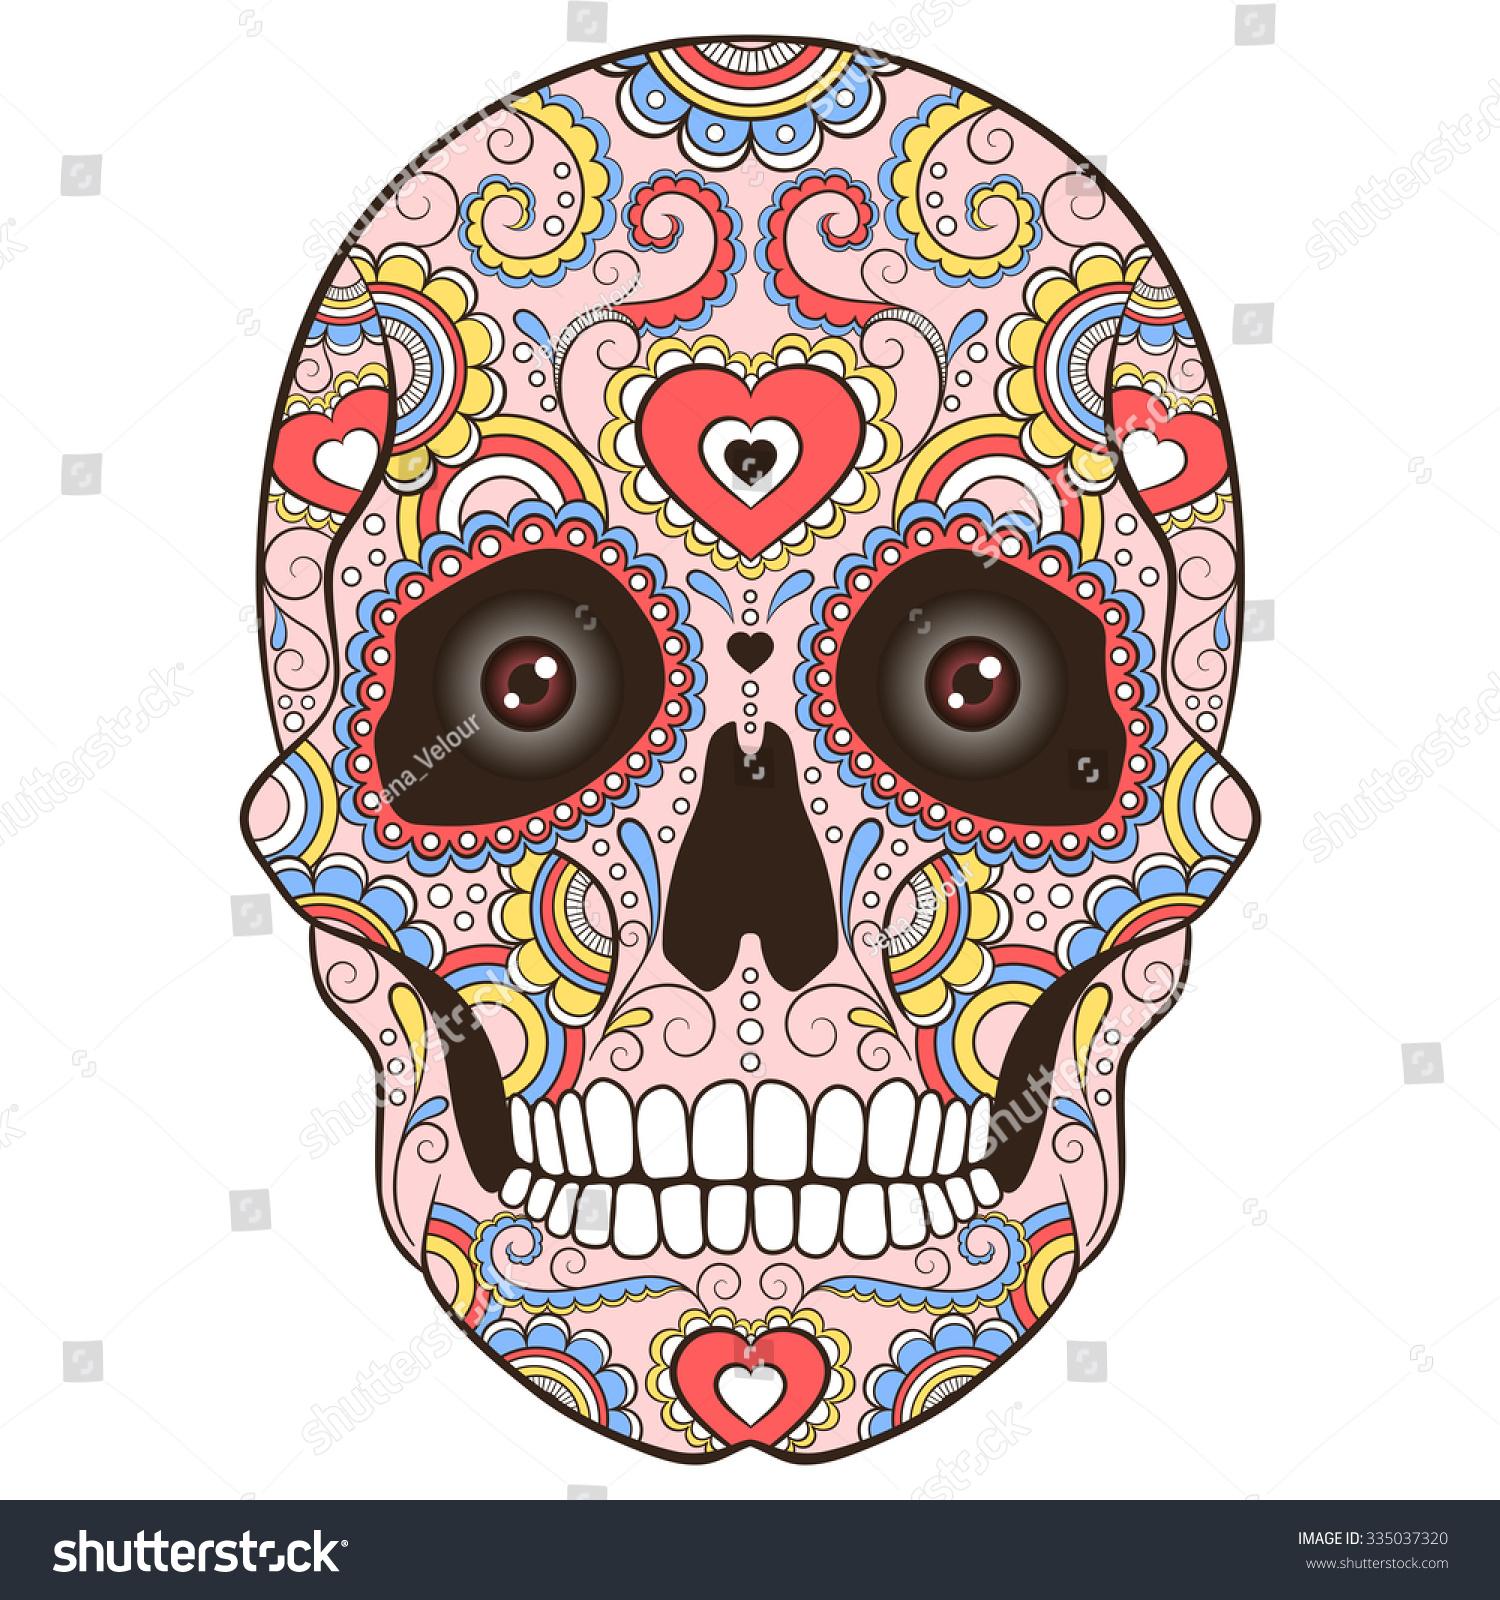 - Colored Sugar Skull Doodle Ornament Vector Stock Vector (Royalty